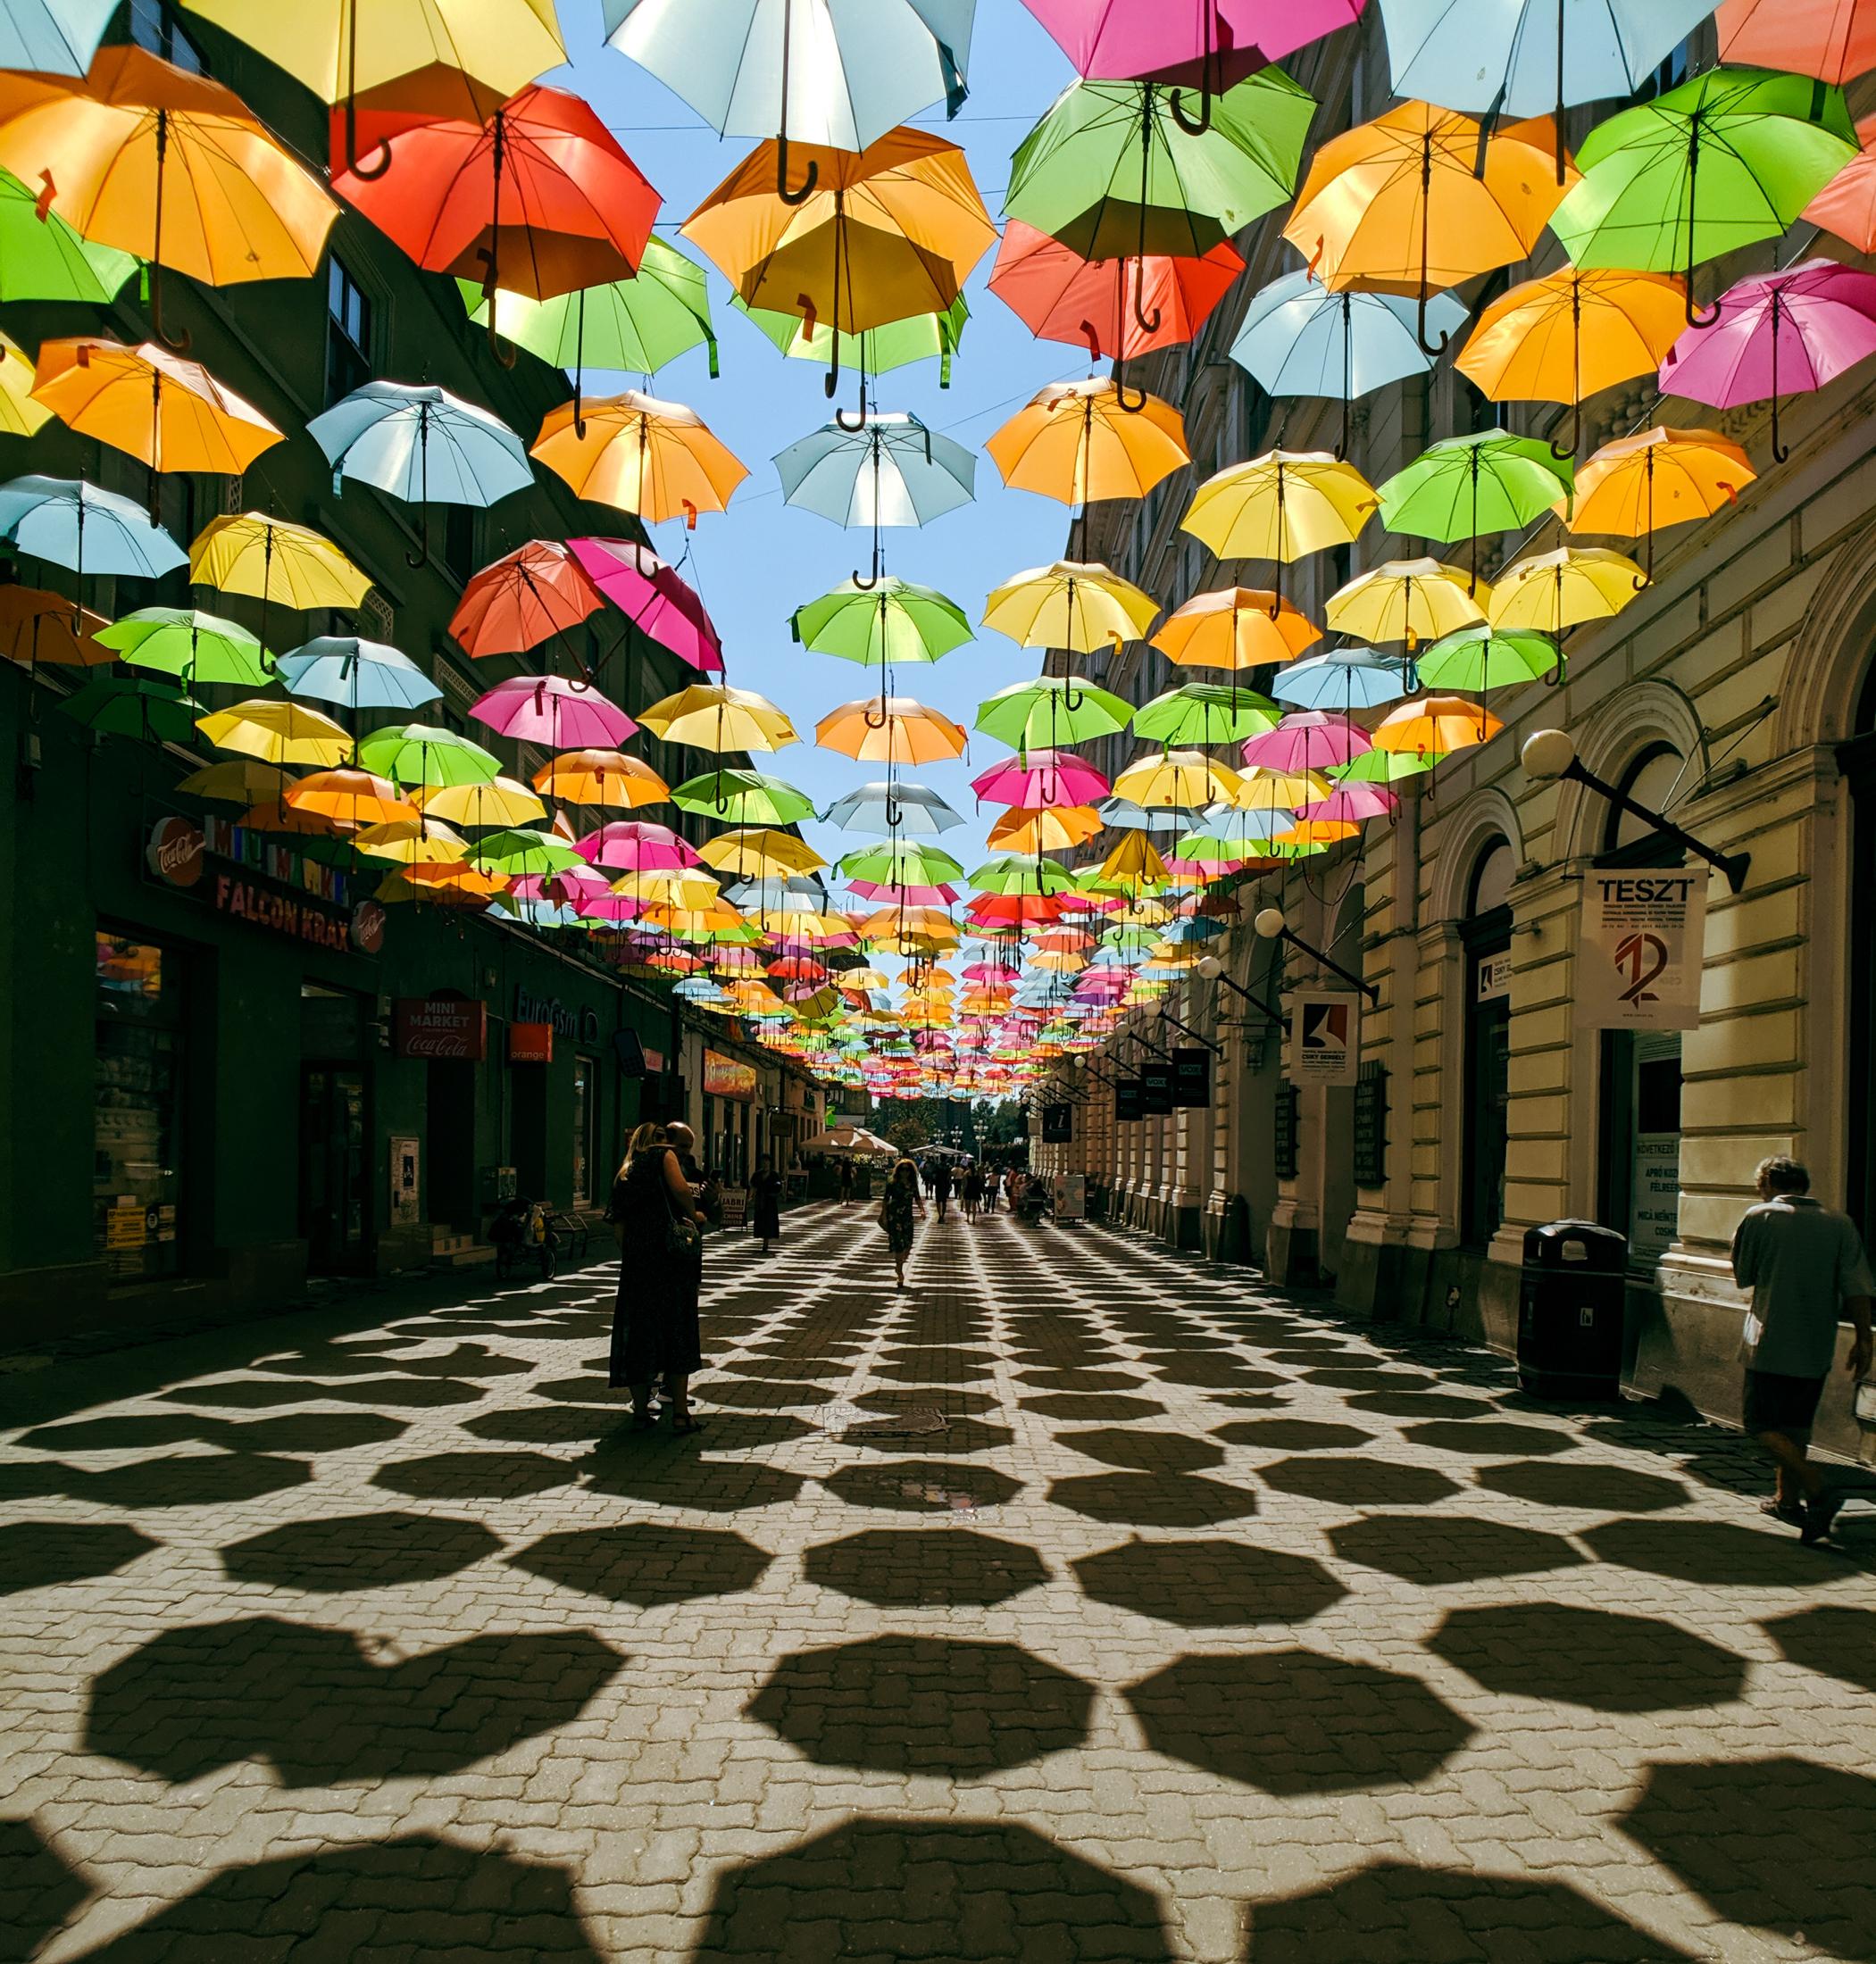 Umbrellas covering a street in timisoara, romania.